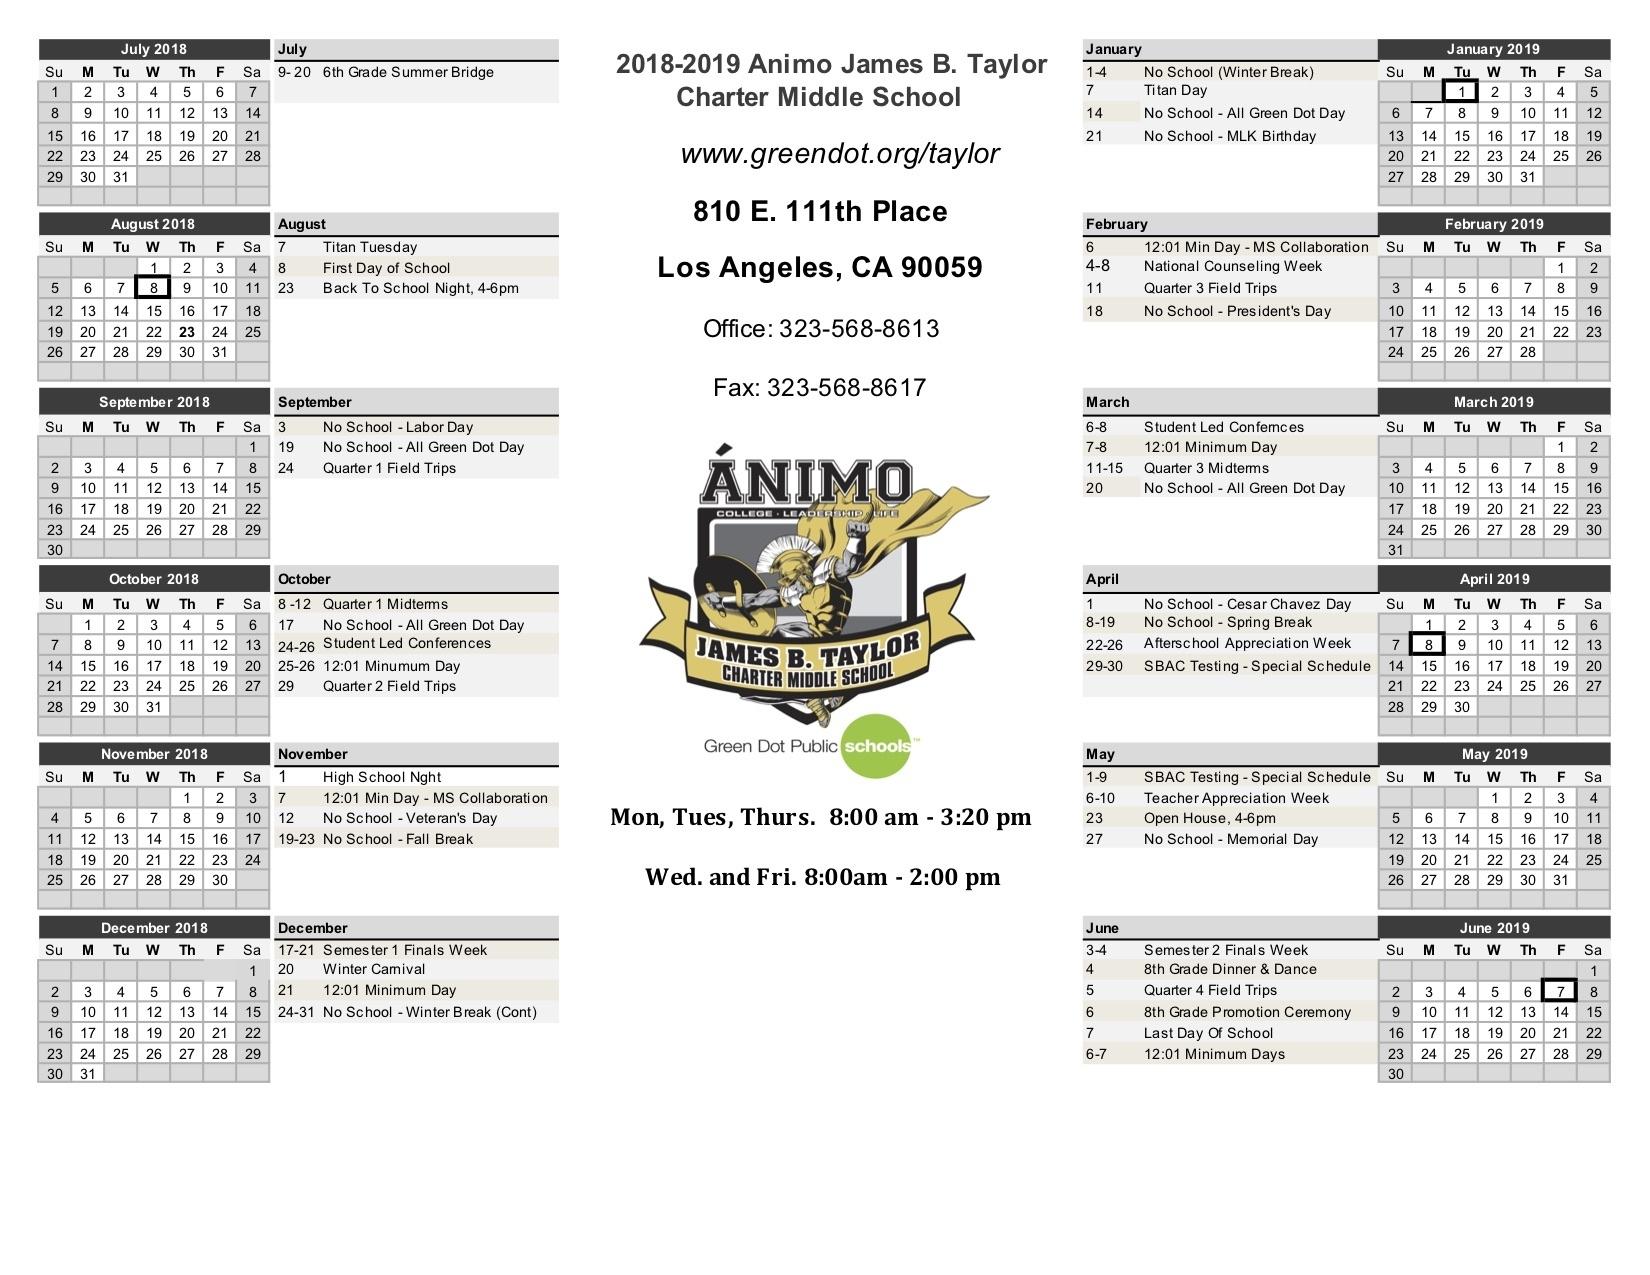 Calendar - Ánimo James B. Taylor Charter Middle School_Calendar School Los Angeles